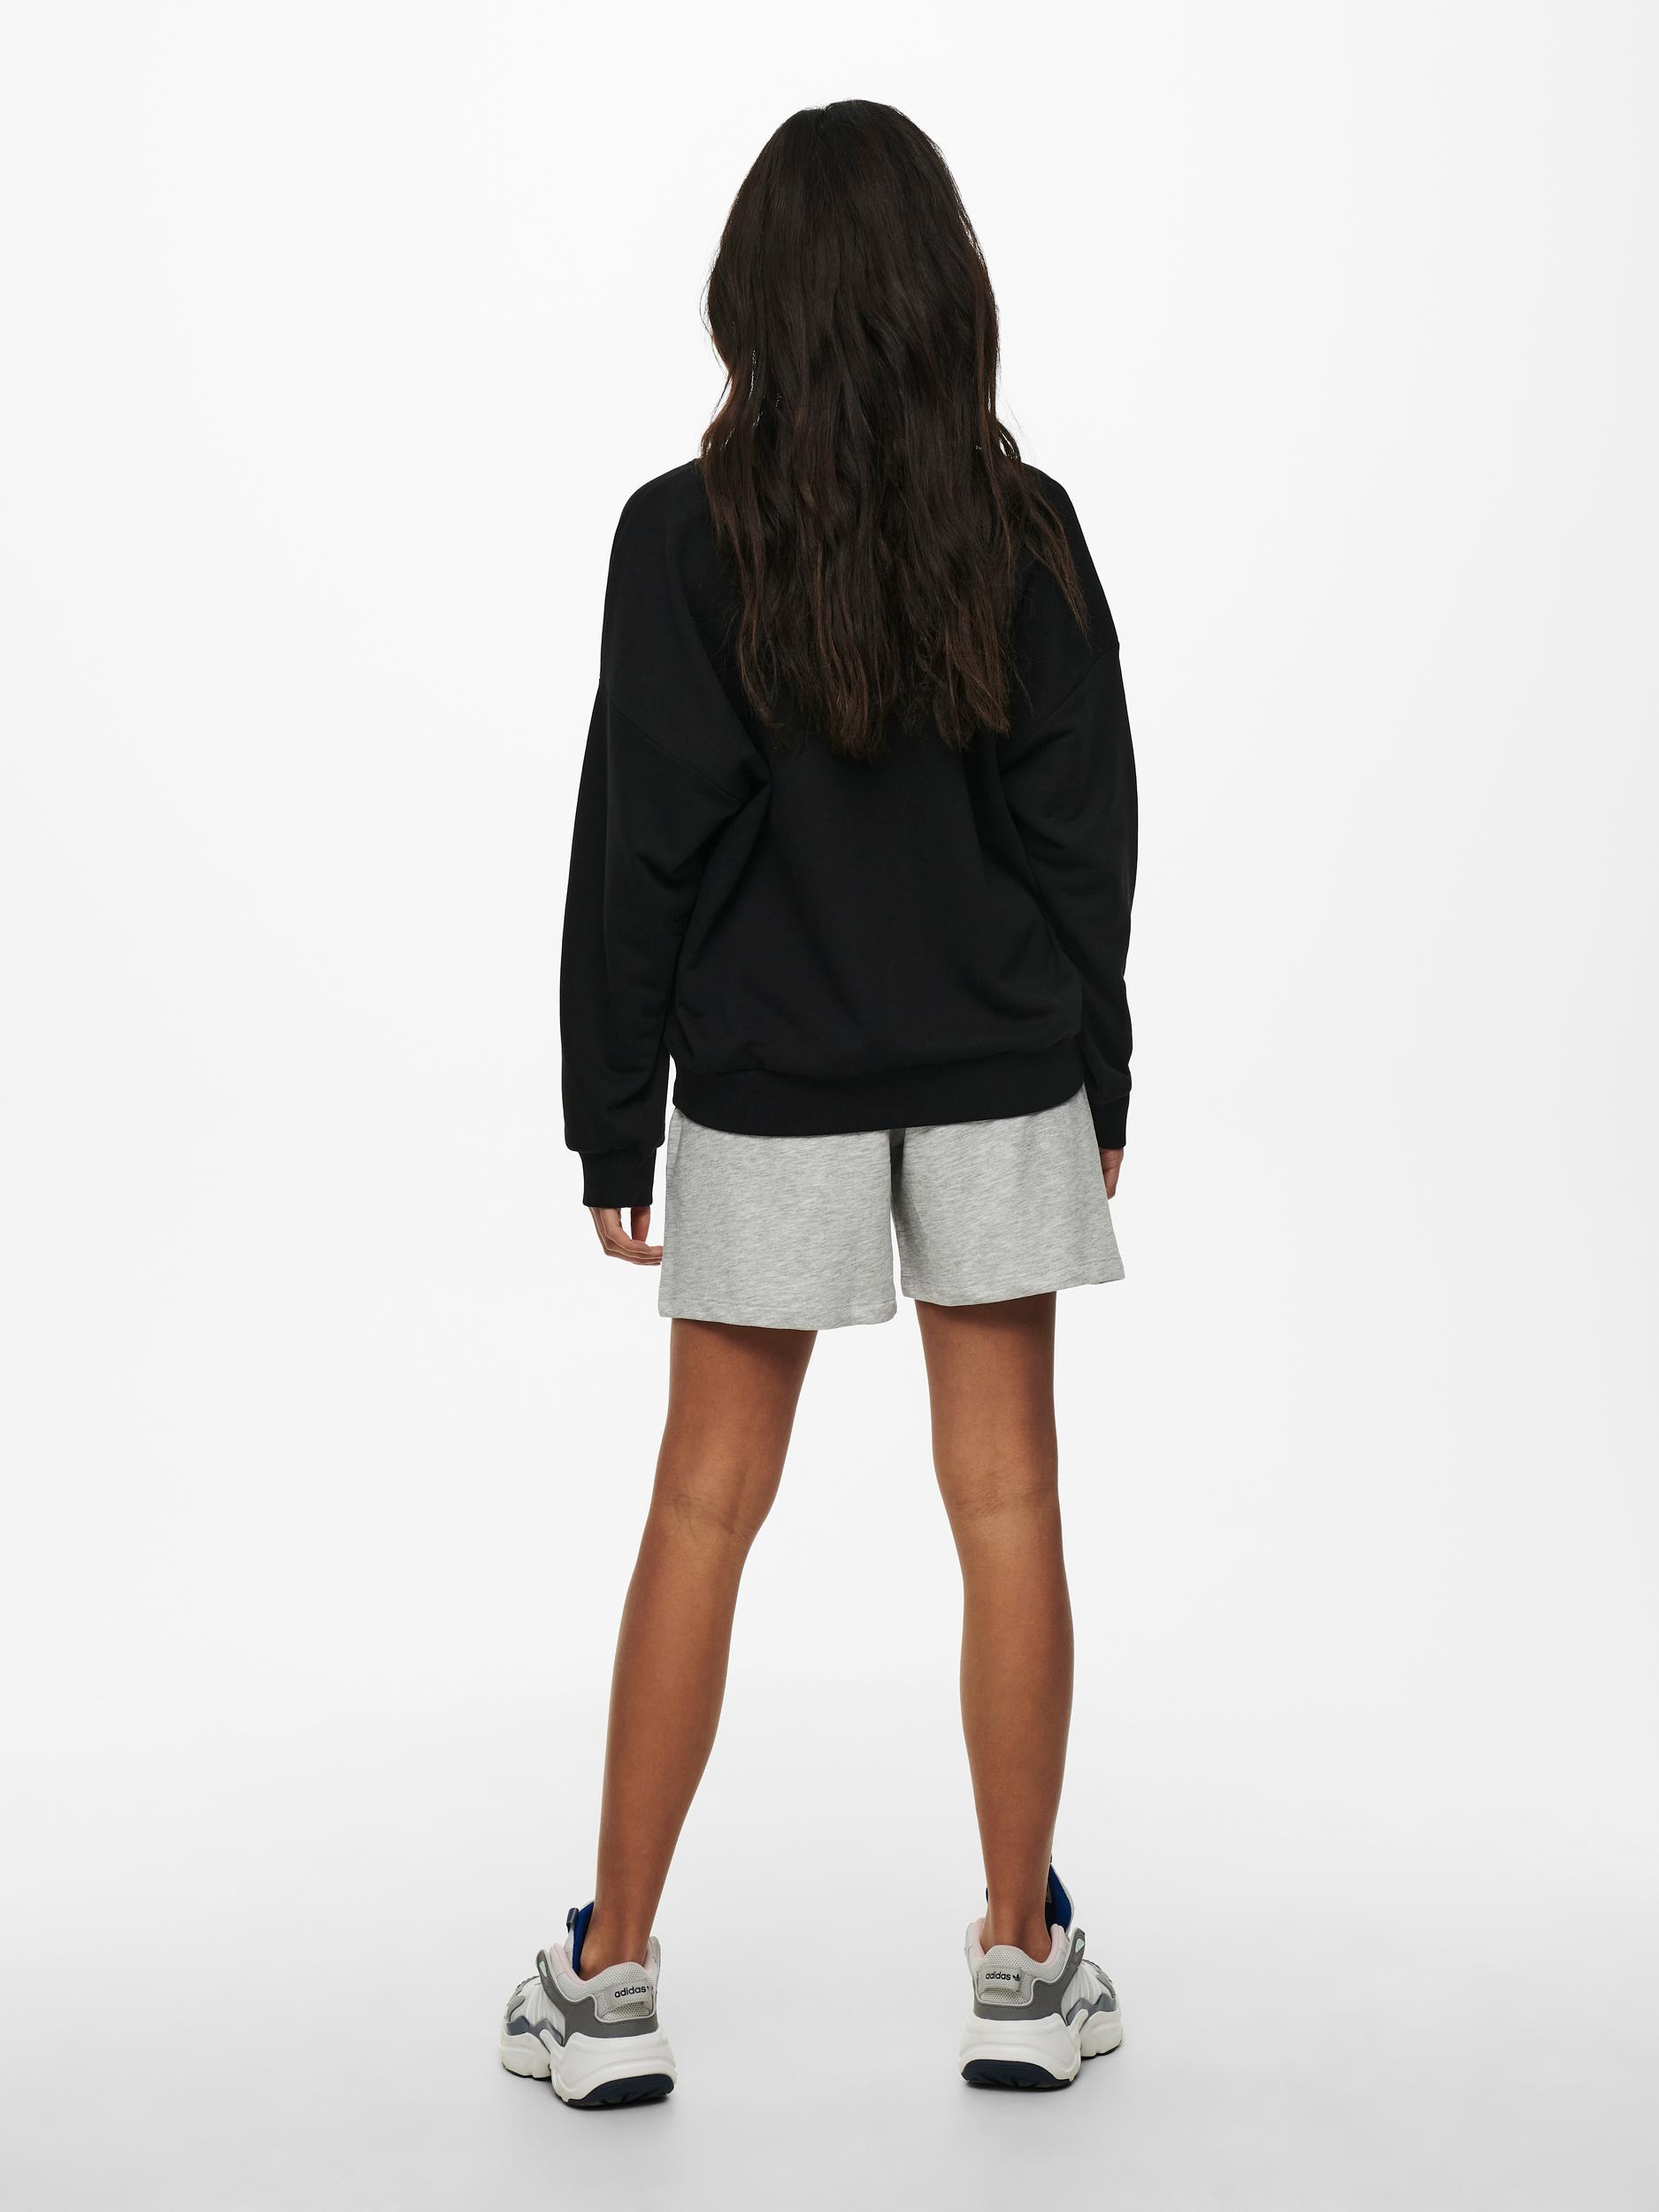 ONLY Kappi L/S sweatshirt, sort, XS